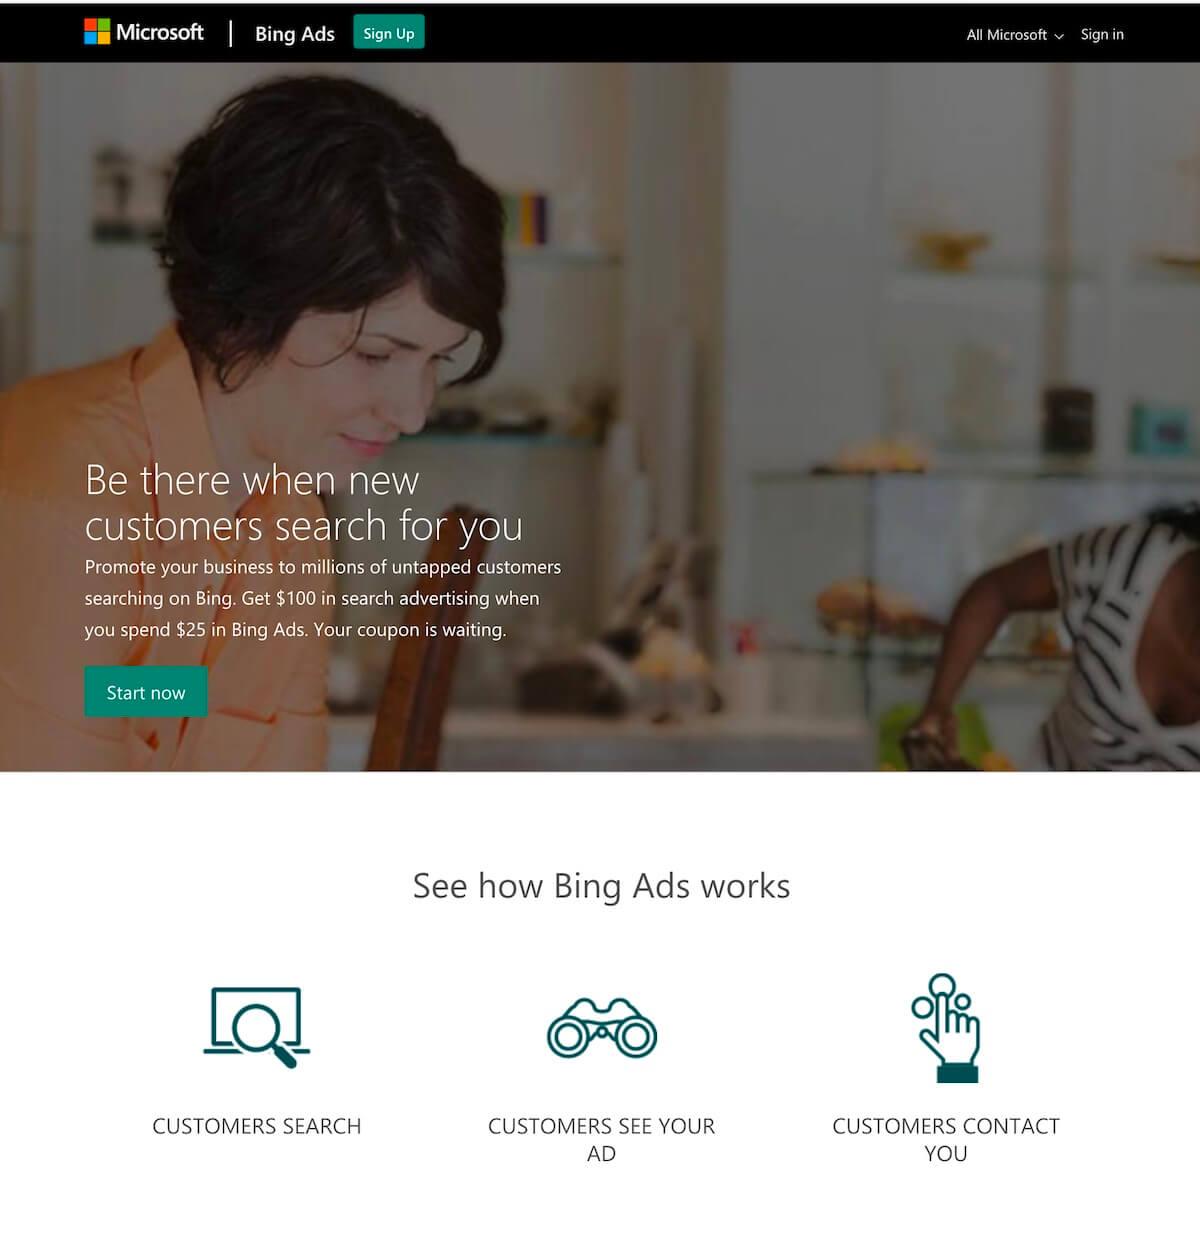 Online Advertising: Bing Ads